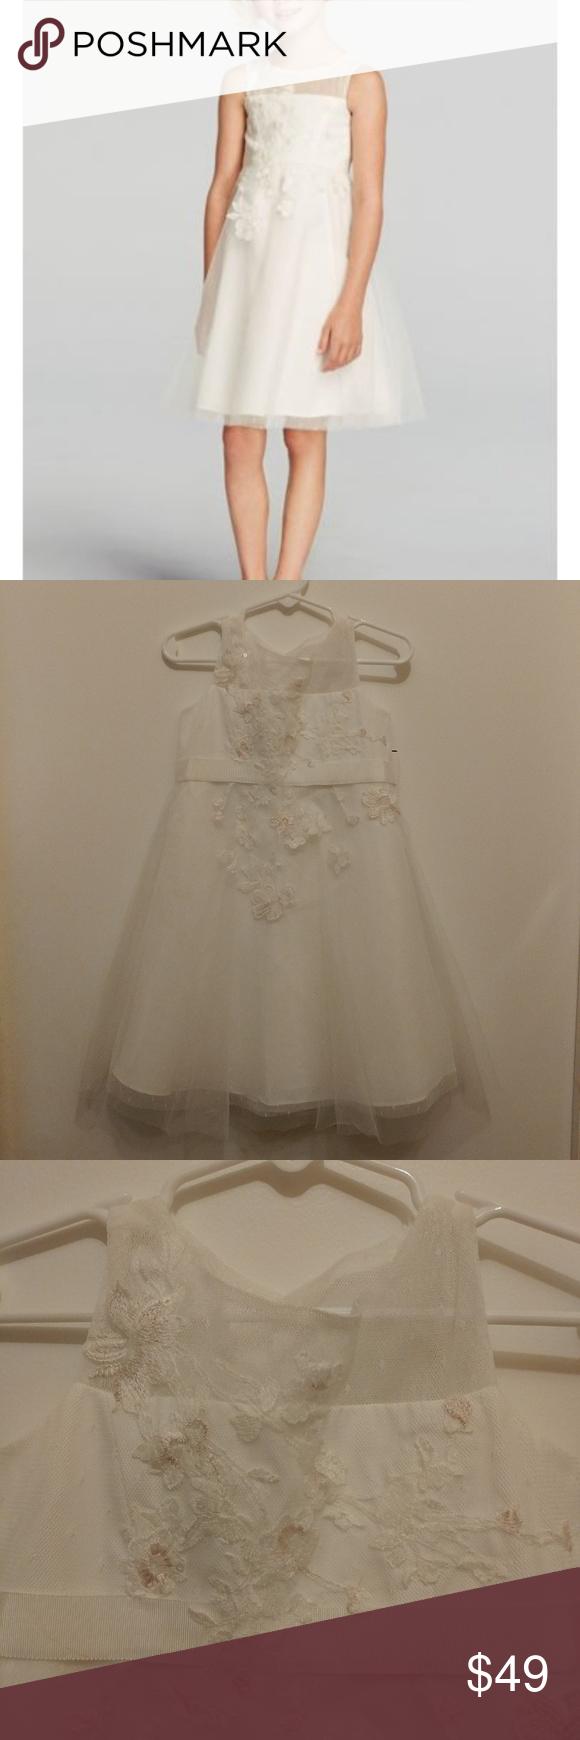 f1f5a0443e4 David s Bridal Flower Girl Dress Size 4 NWT David s Bridal Lace Applique  Illusion Neckline Tulle Dress